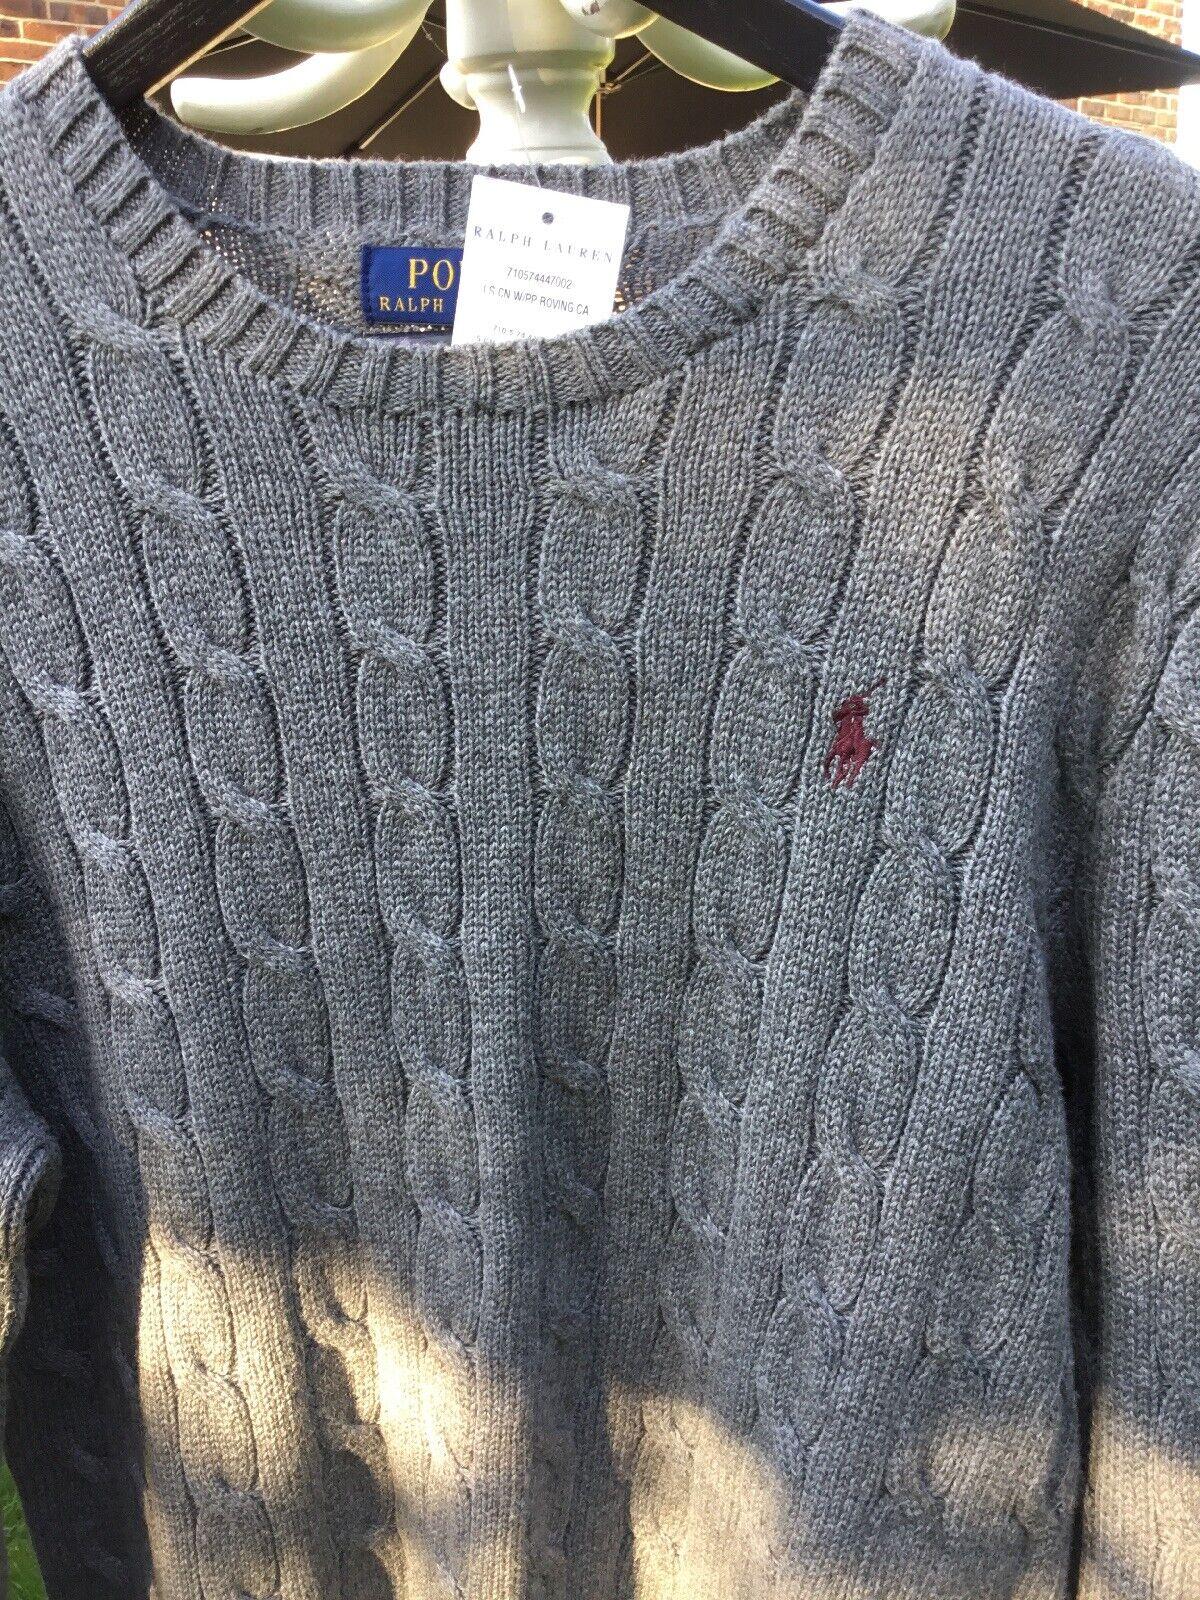 Charcoal grau Cable Knit herren Ralph Lauren Jumper Größe S